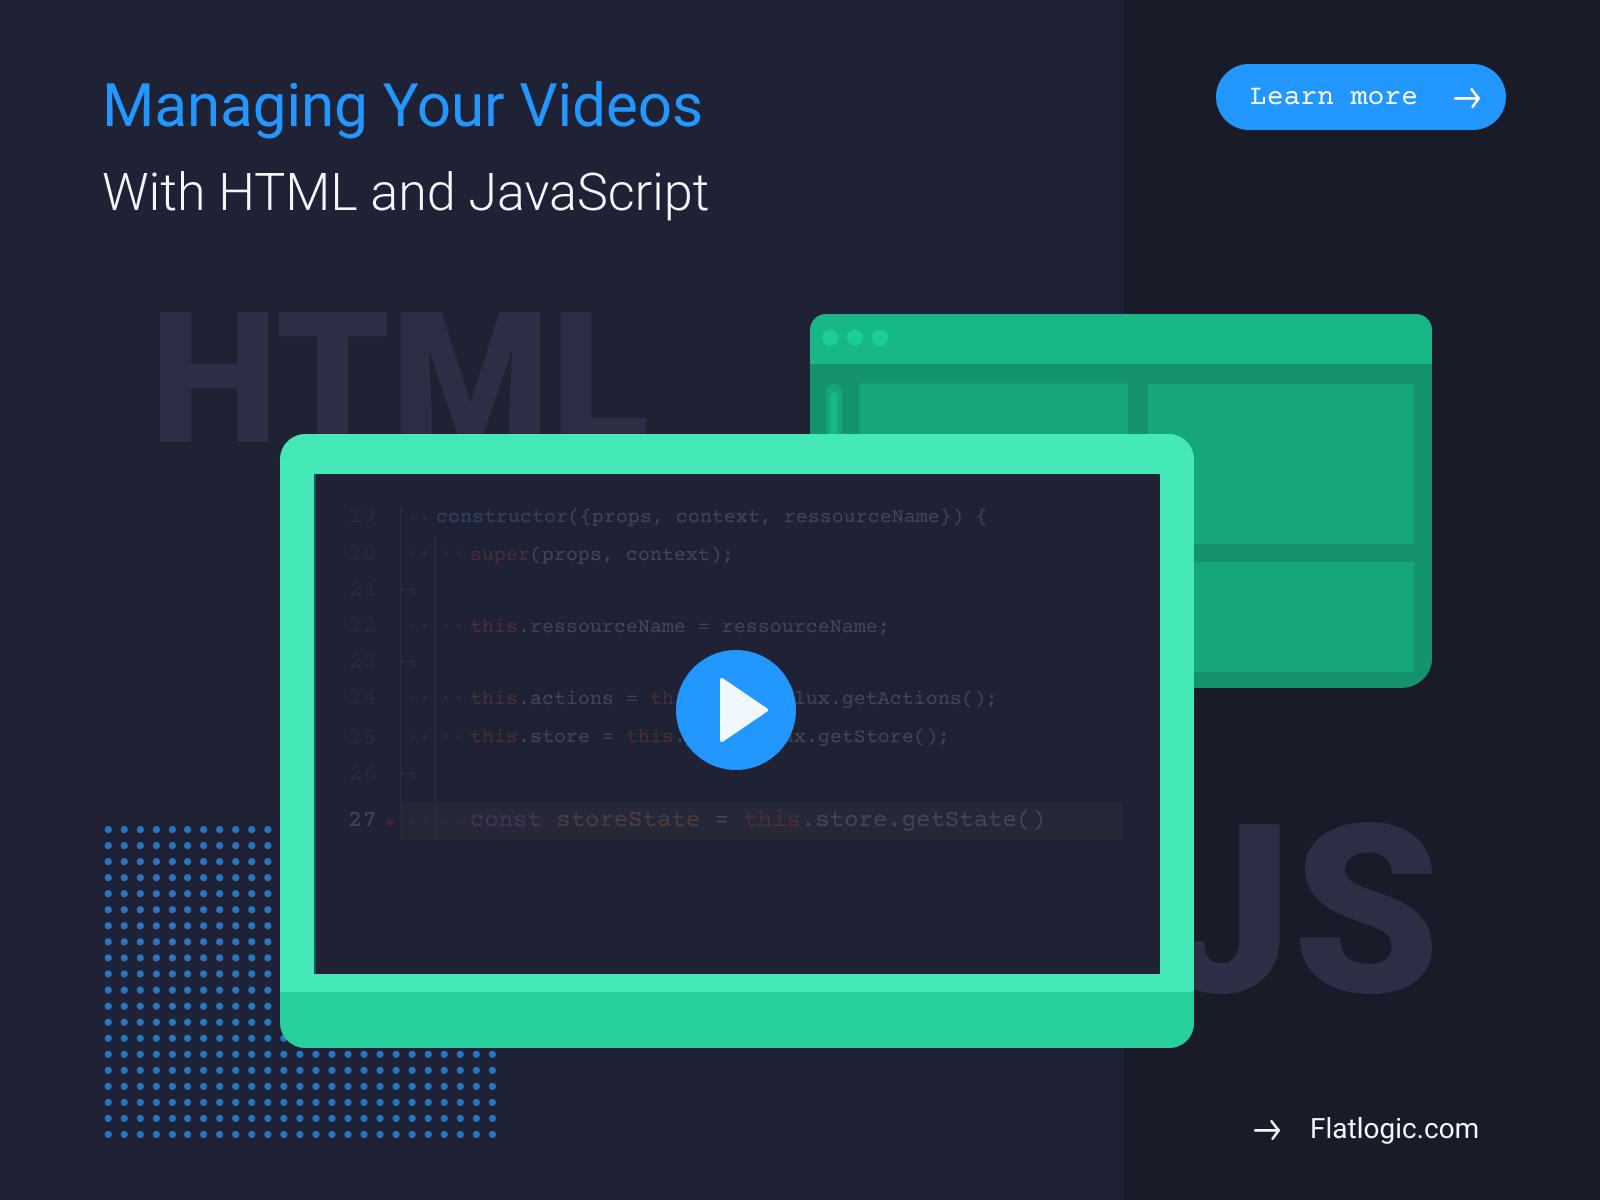 Using HTML and JavaScript to Manipulate Videos - Flatlogic Blog